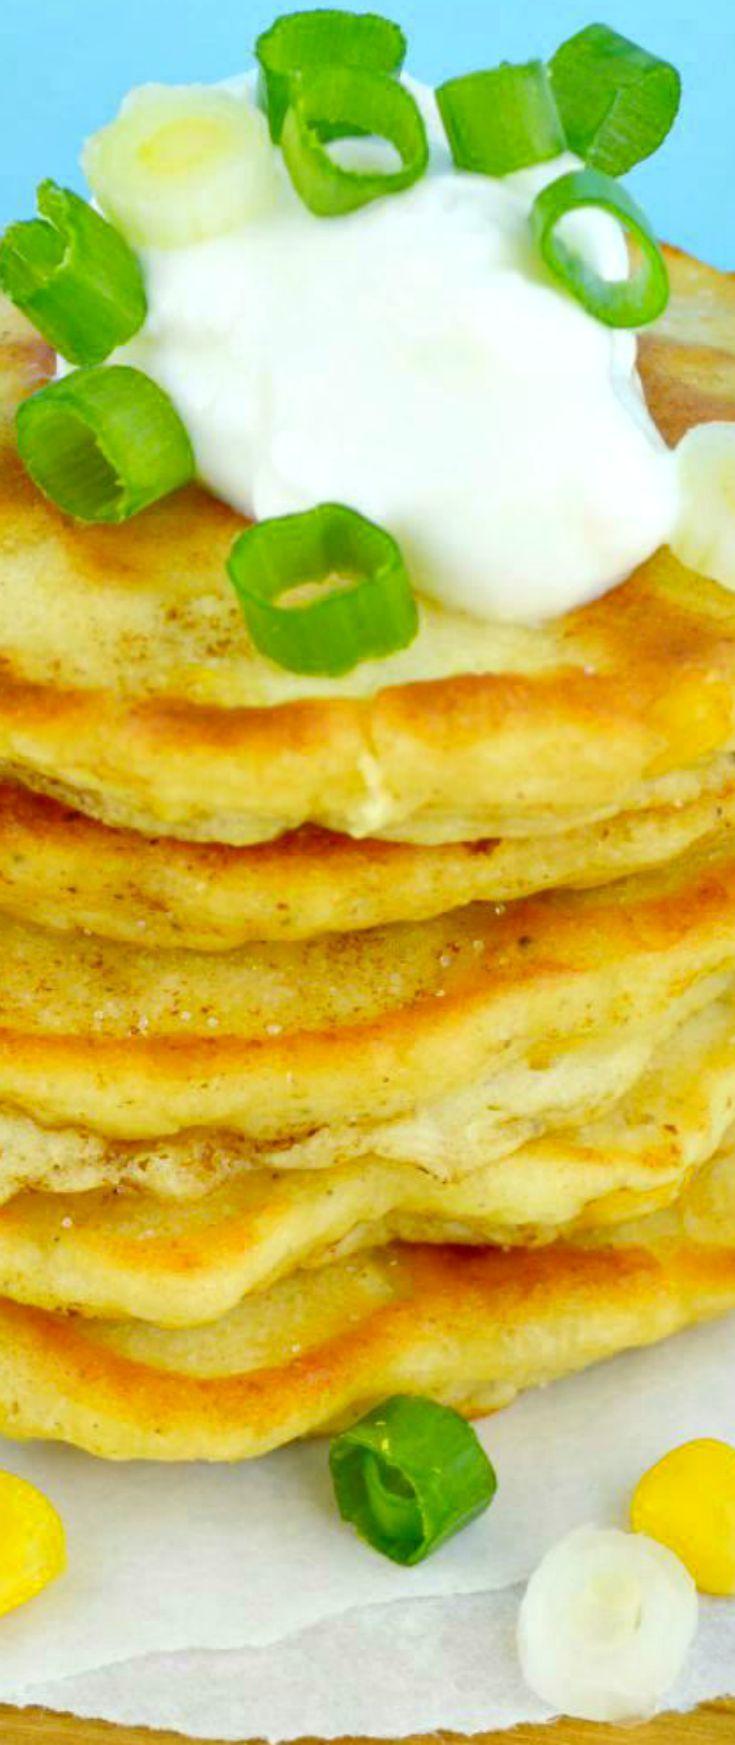 Griddle fried corn cake recipe